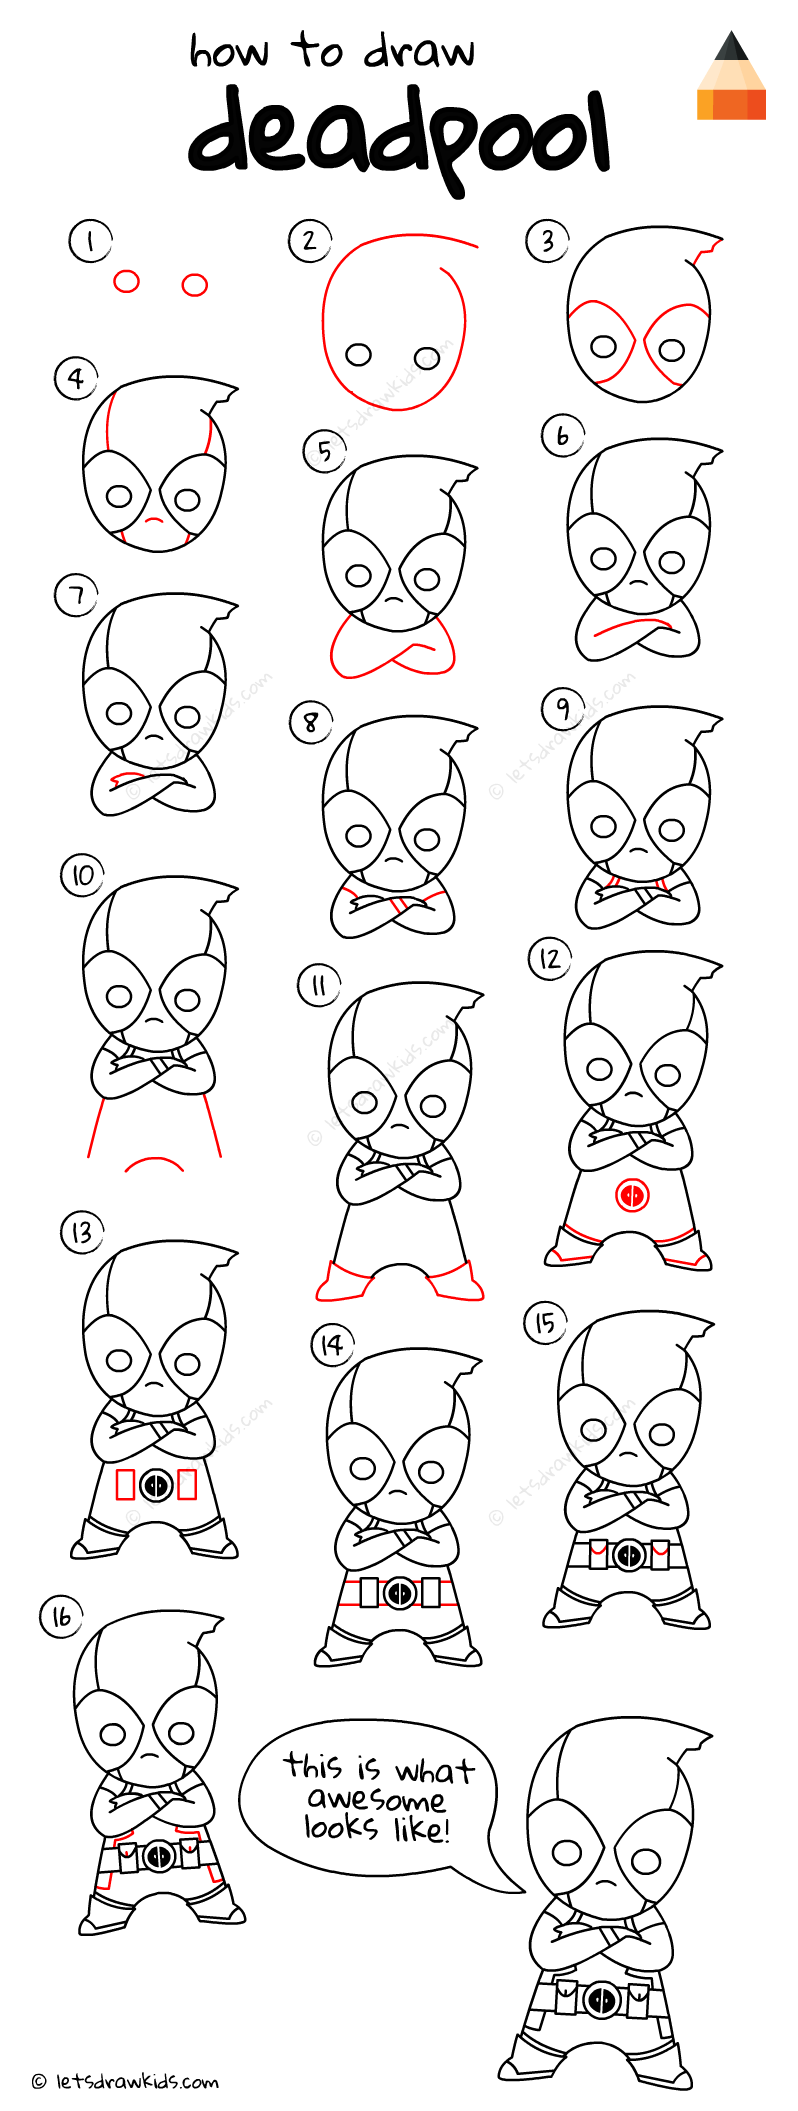 Pin De Eileen Rodriguez En How To Draw Como Dibujar Facil Dibujos Fáciles Cómo Dibujar Cosas